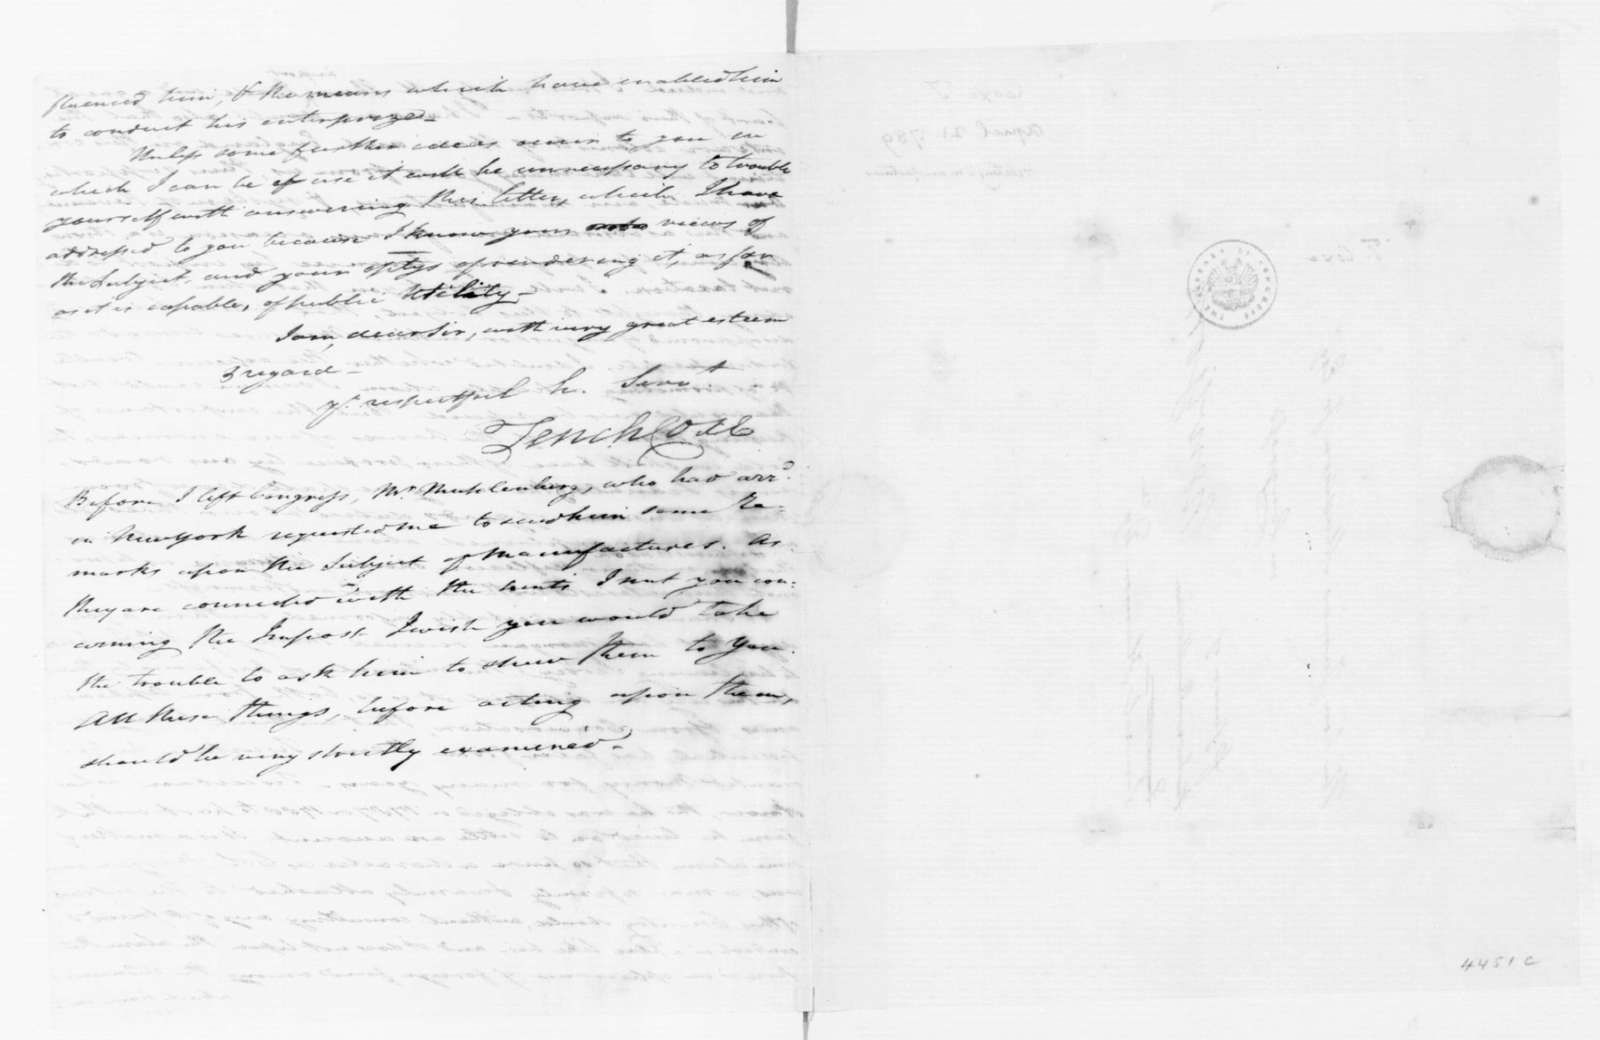 Tench Coxe to James Madison, April 21, 1789.